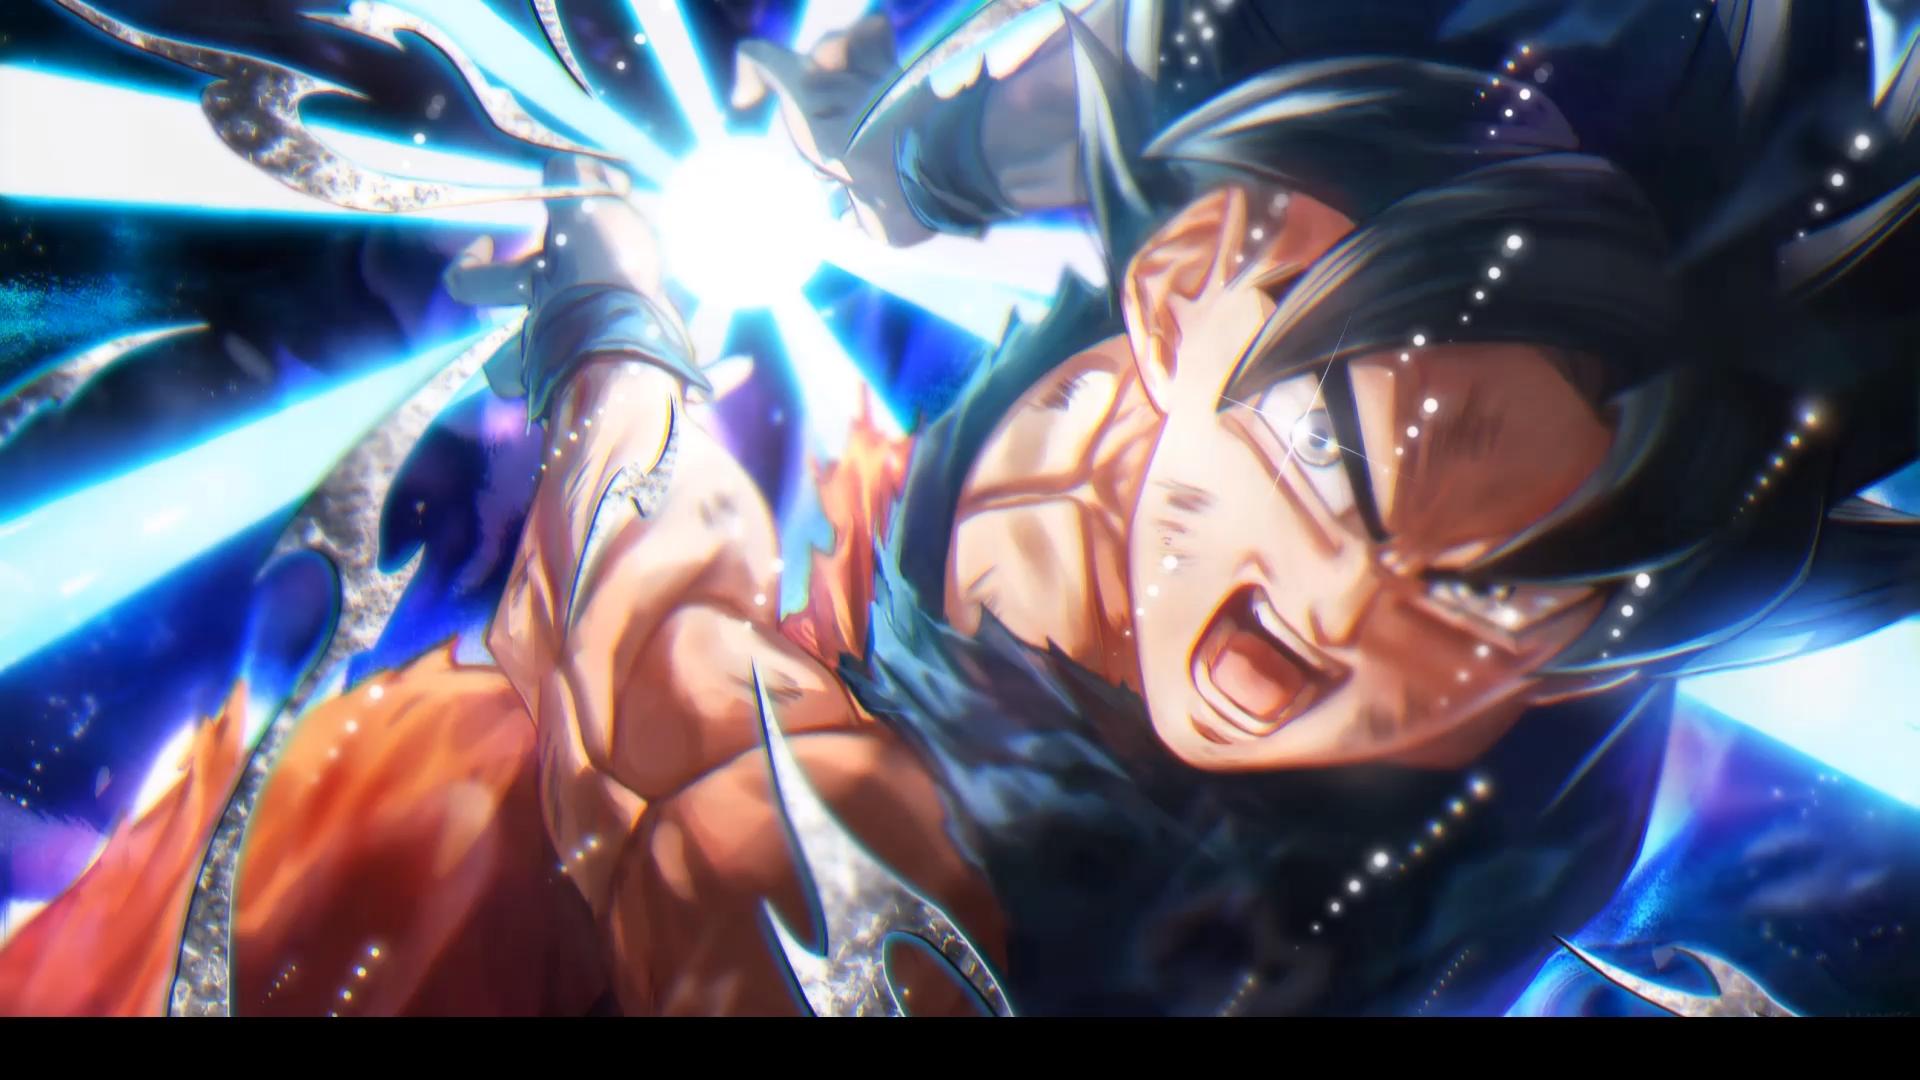 Ultra Instinct Son Goku Dragon Ball Super Anime Wallpaper Video In 2020 Dragon Ball Wallpapers Dragon Ball Super Wallpapers Dragon Ball Super Manga